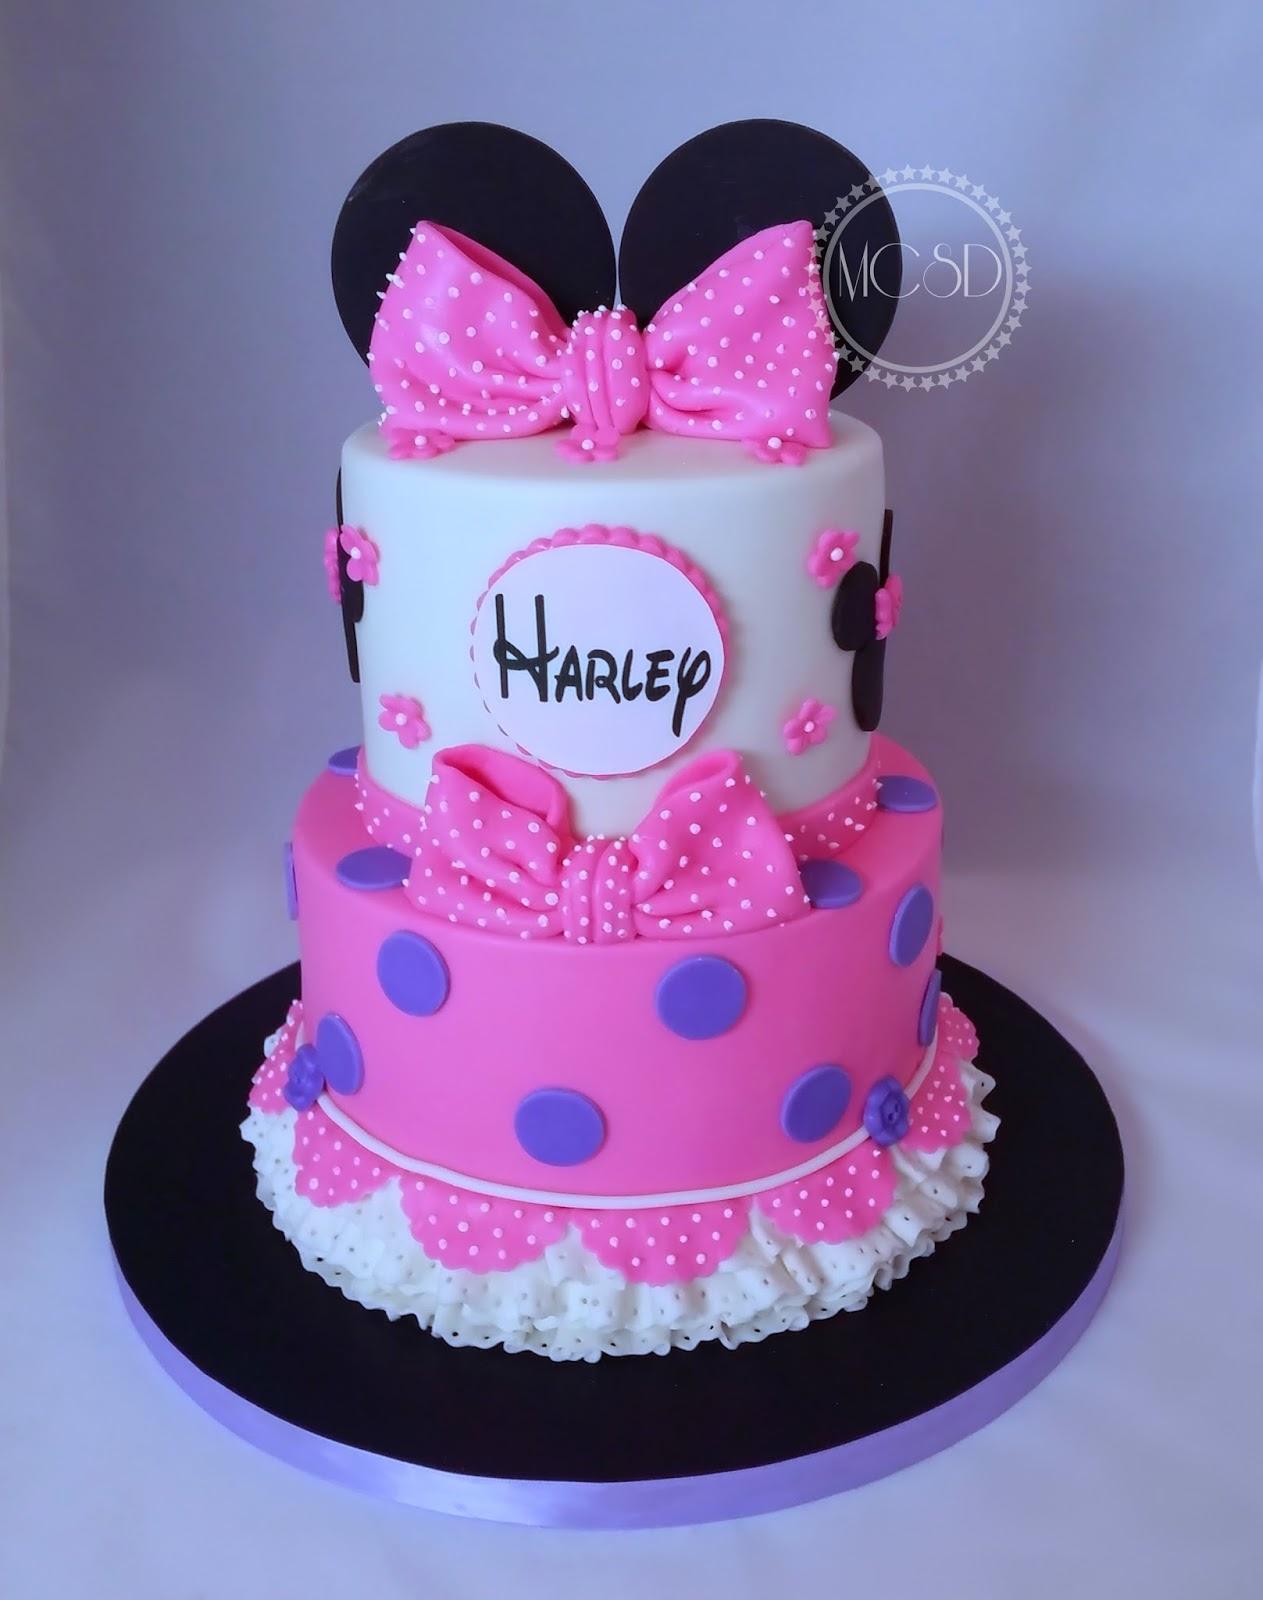 My Cake Sweet Dreams Minnie Mouse 1st Birthday Cake